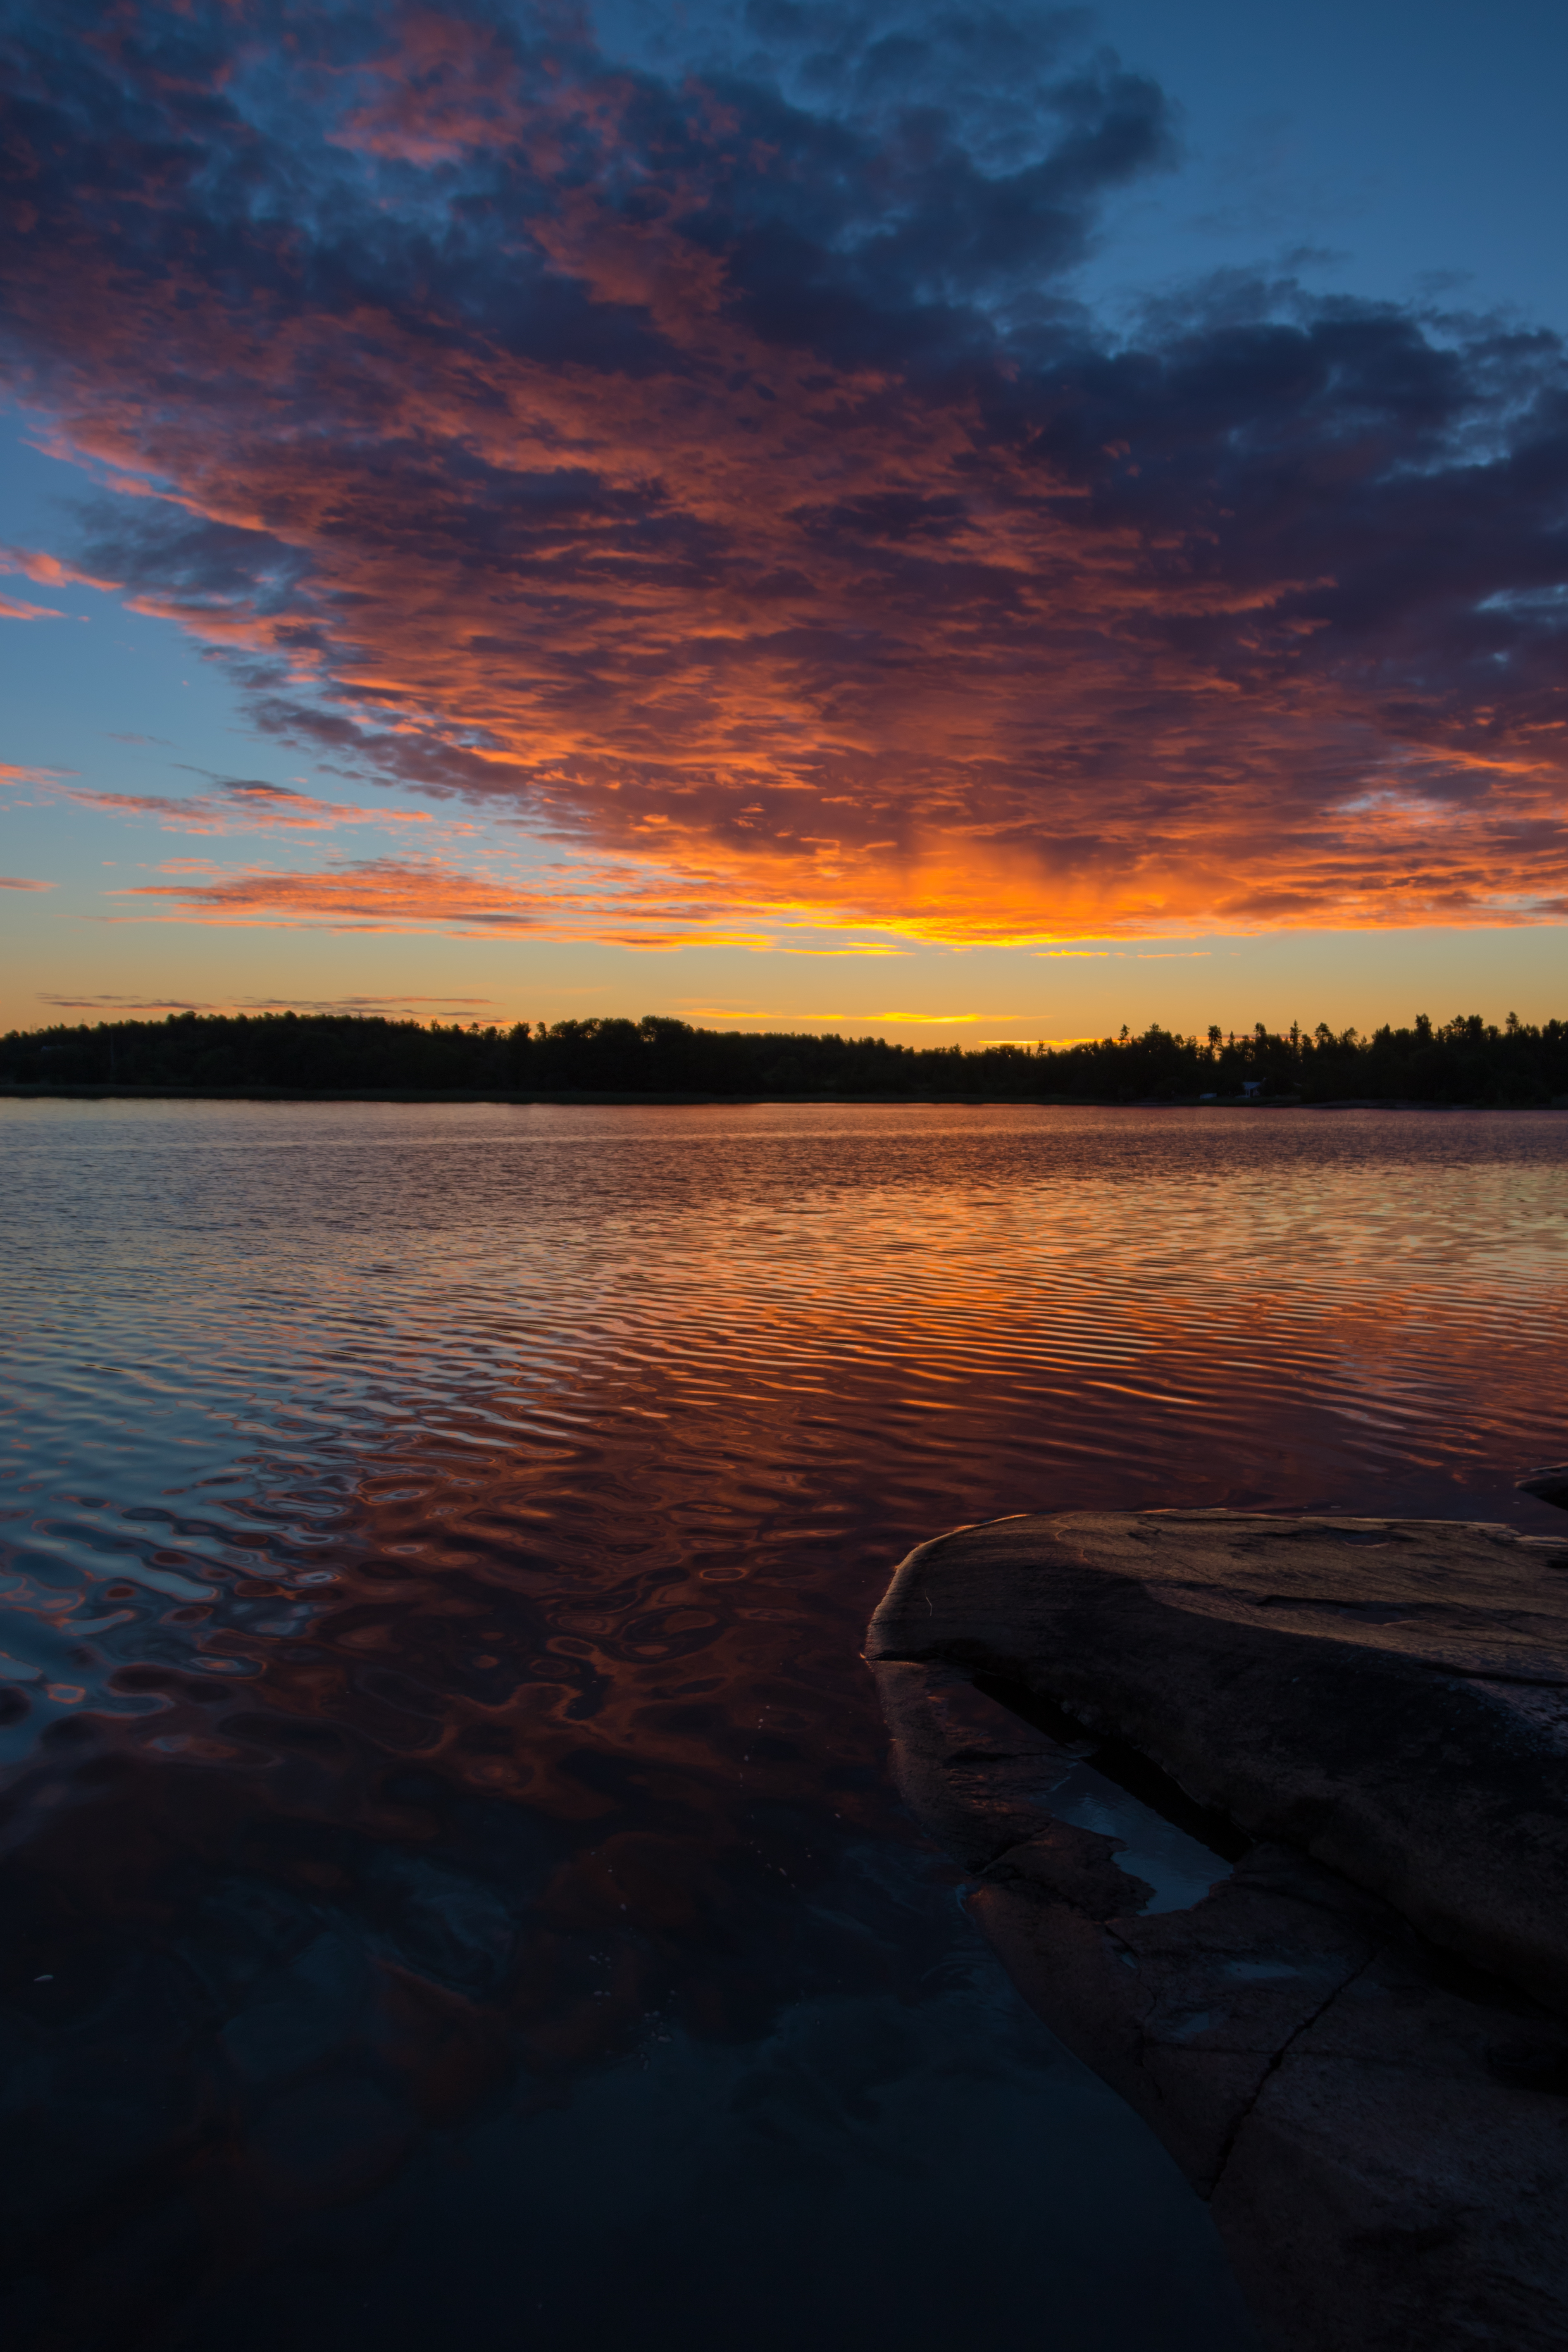 142562 Заставки и Обои Облака на телефон. Скачать Природа, Озеро, Закат, Архипелаг, Небо, Облака картинки бесплатно